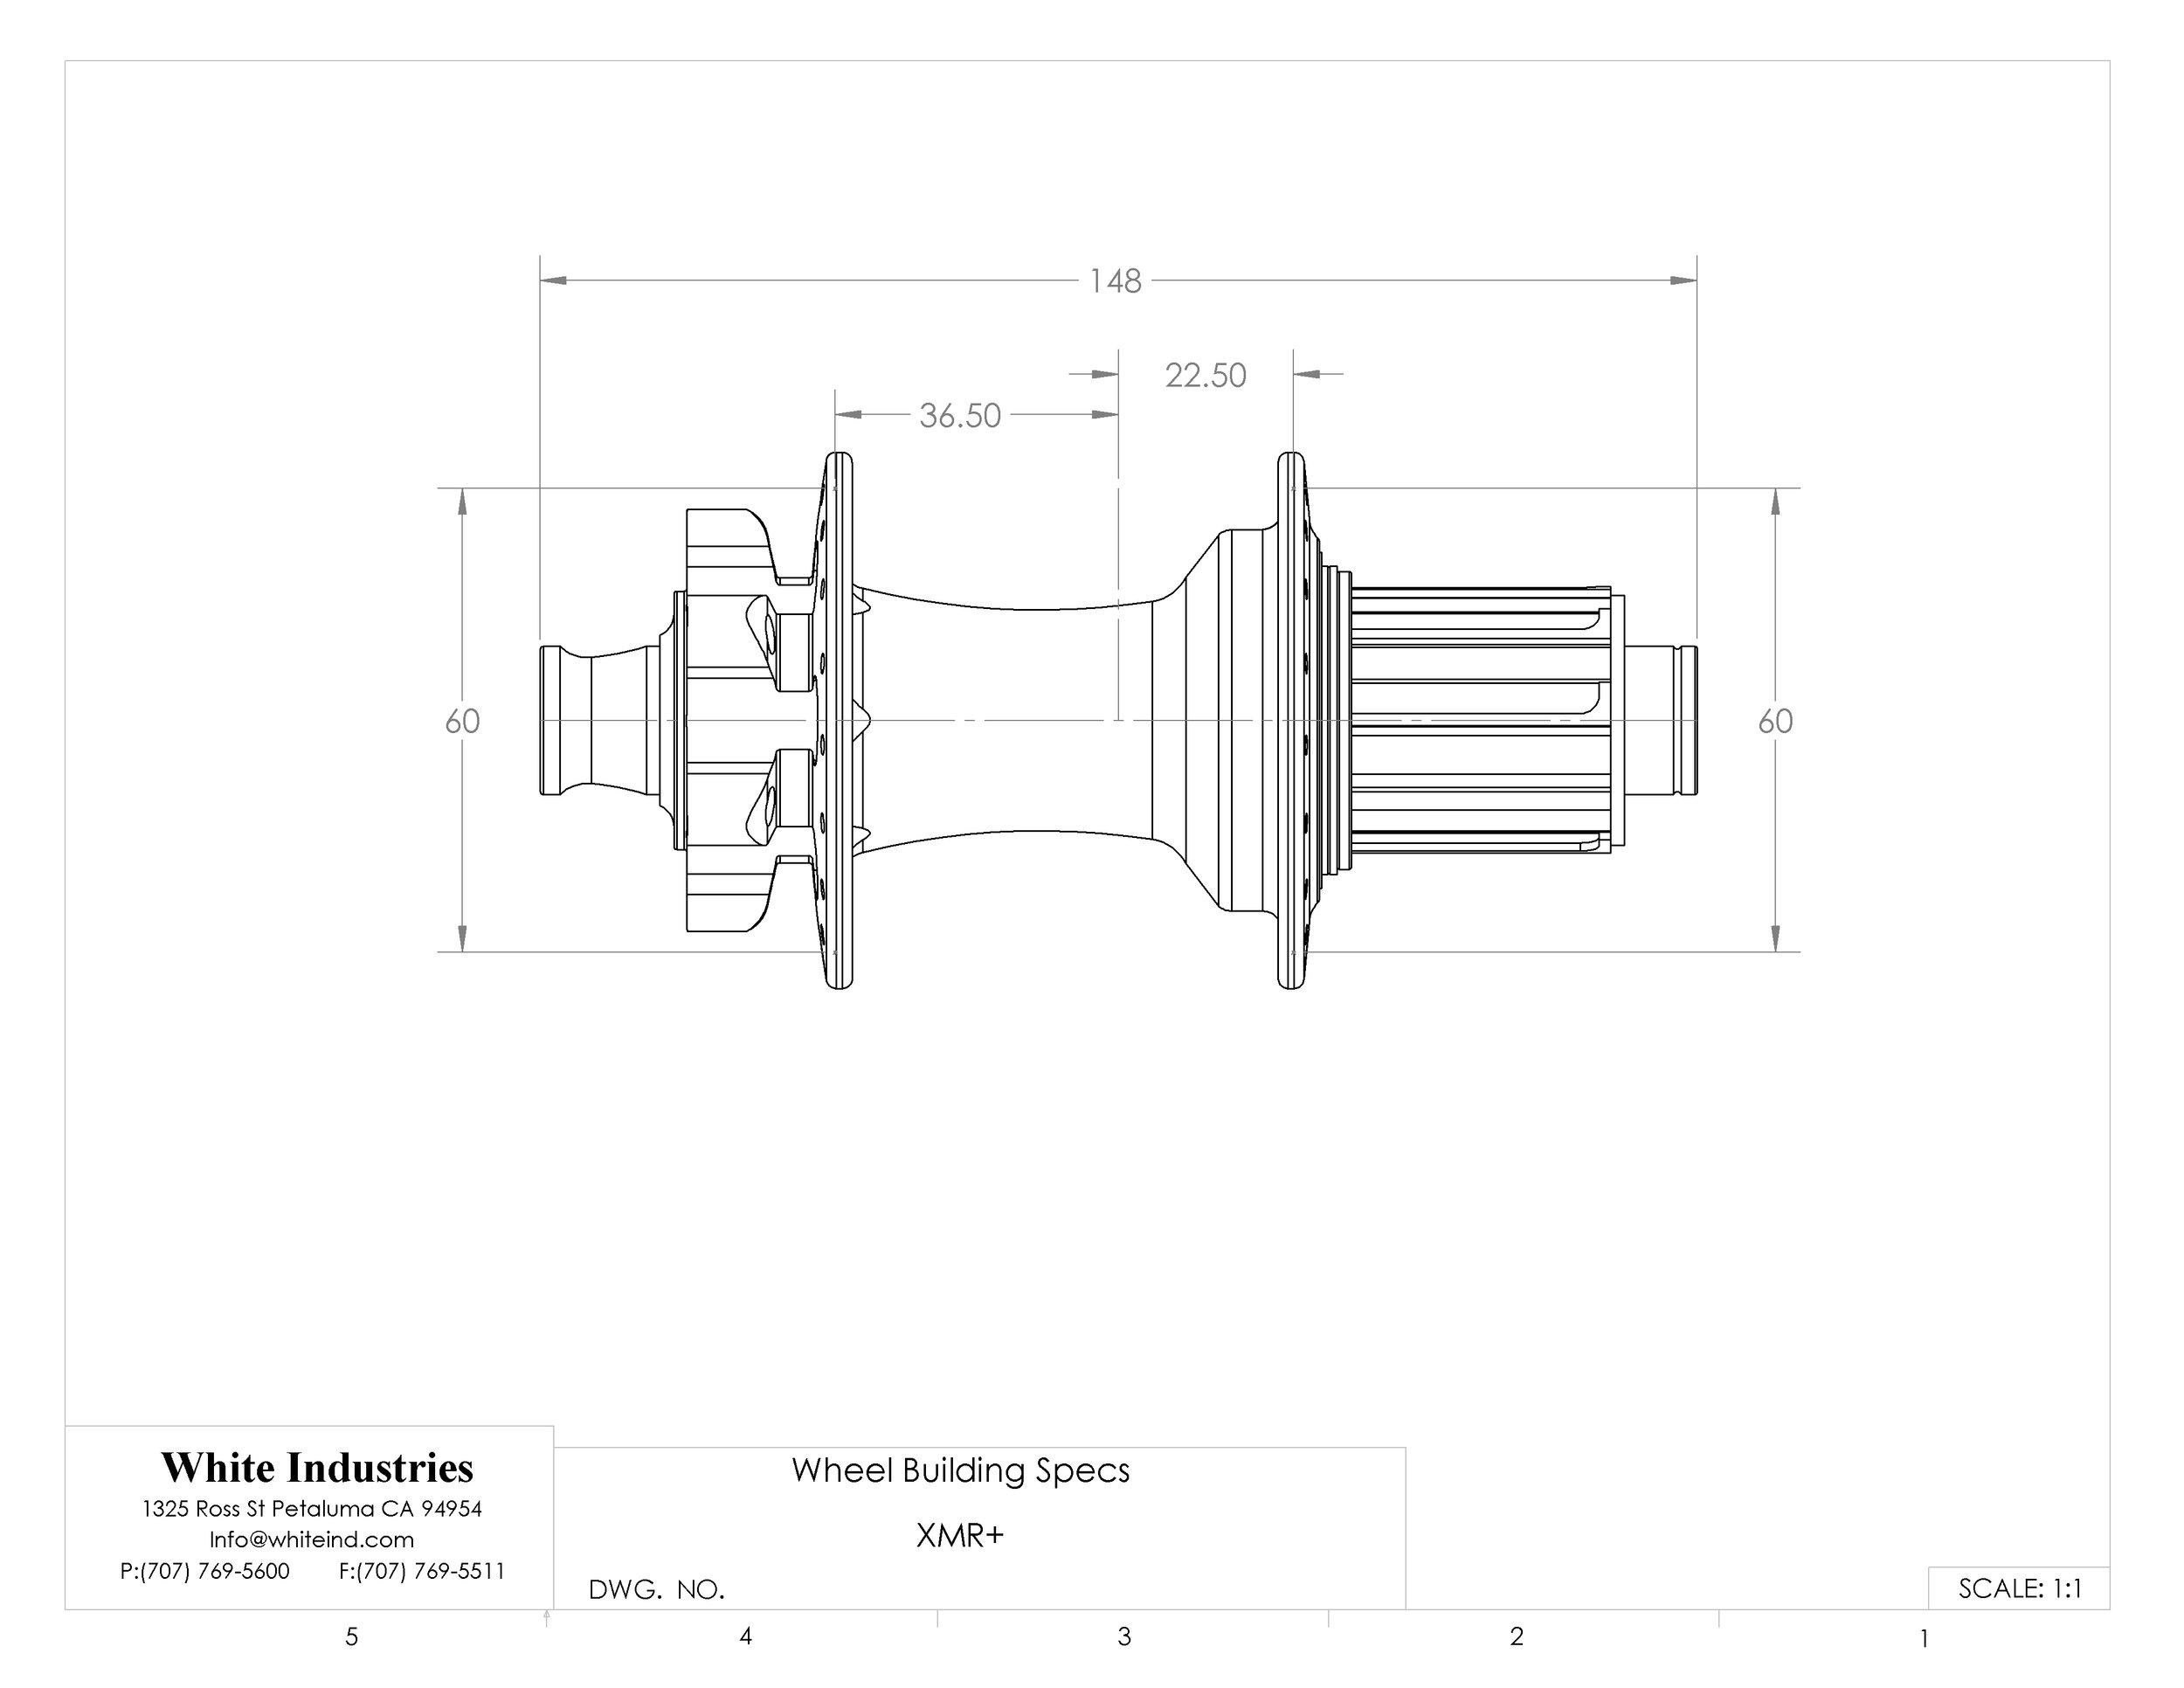 REAR XMR+ WHEEL BUILDING SPECS.JPG